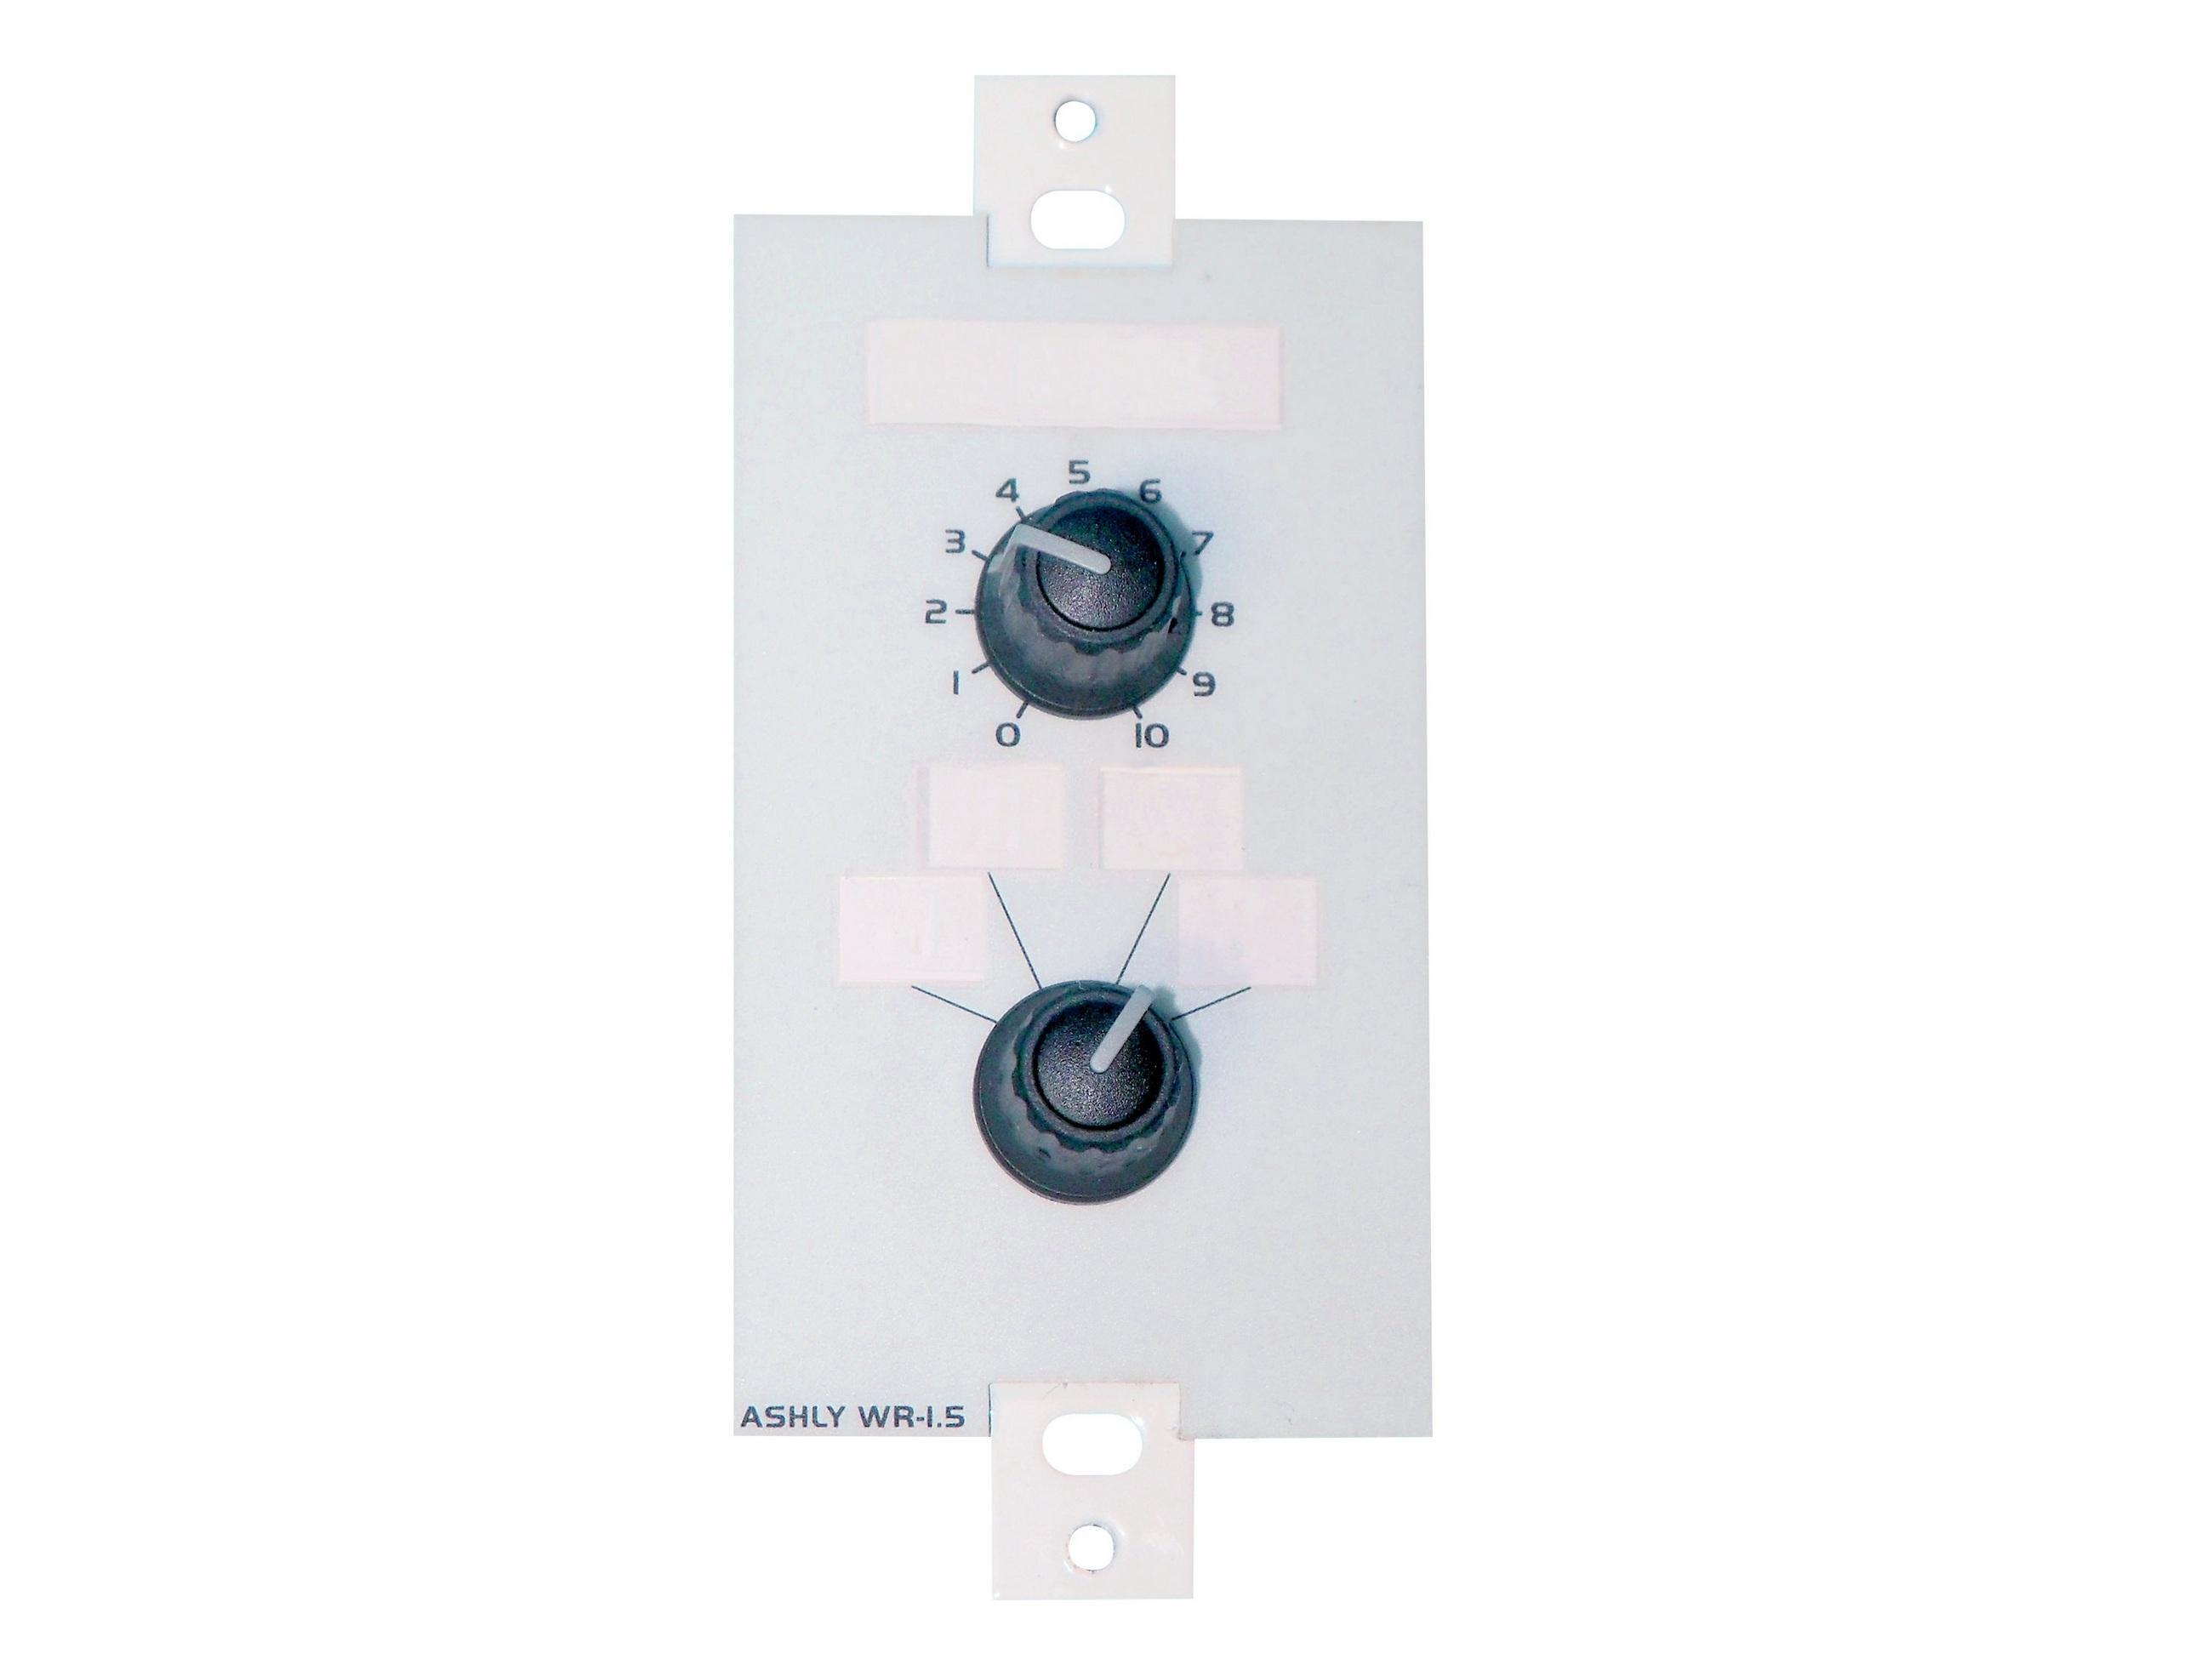 Ashly WR-1 Wall Remote//dual rotary potentiometer